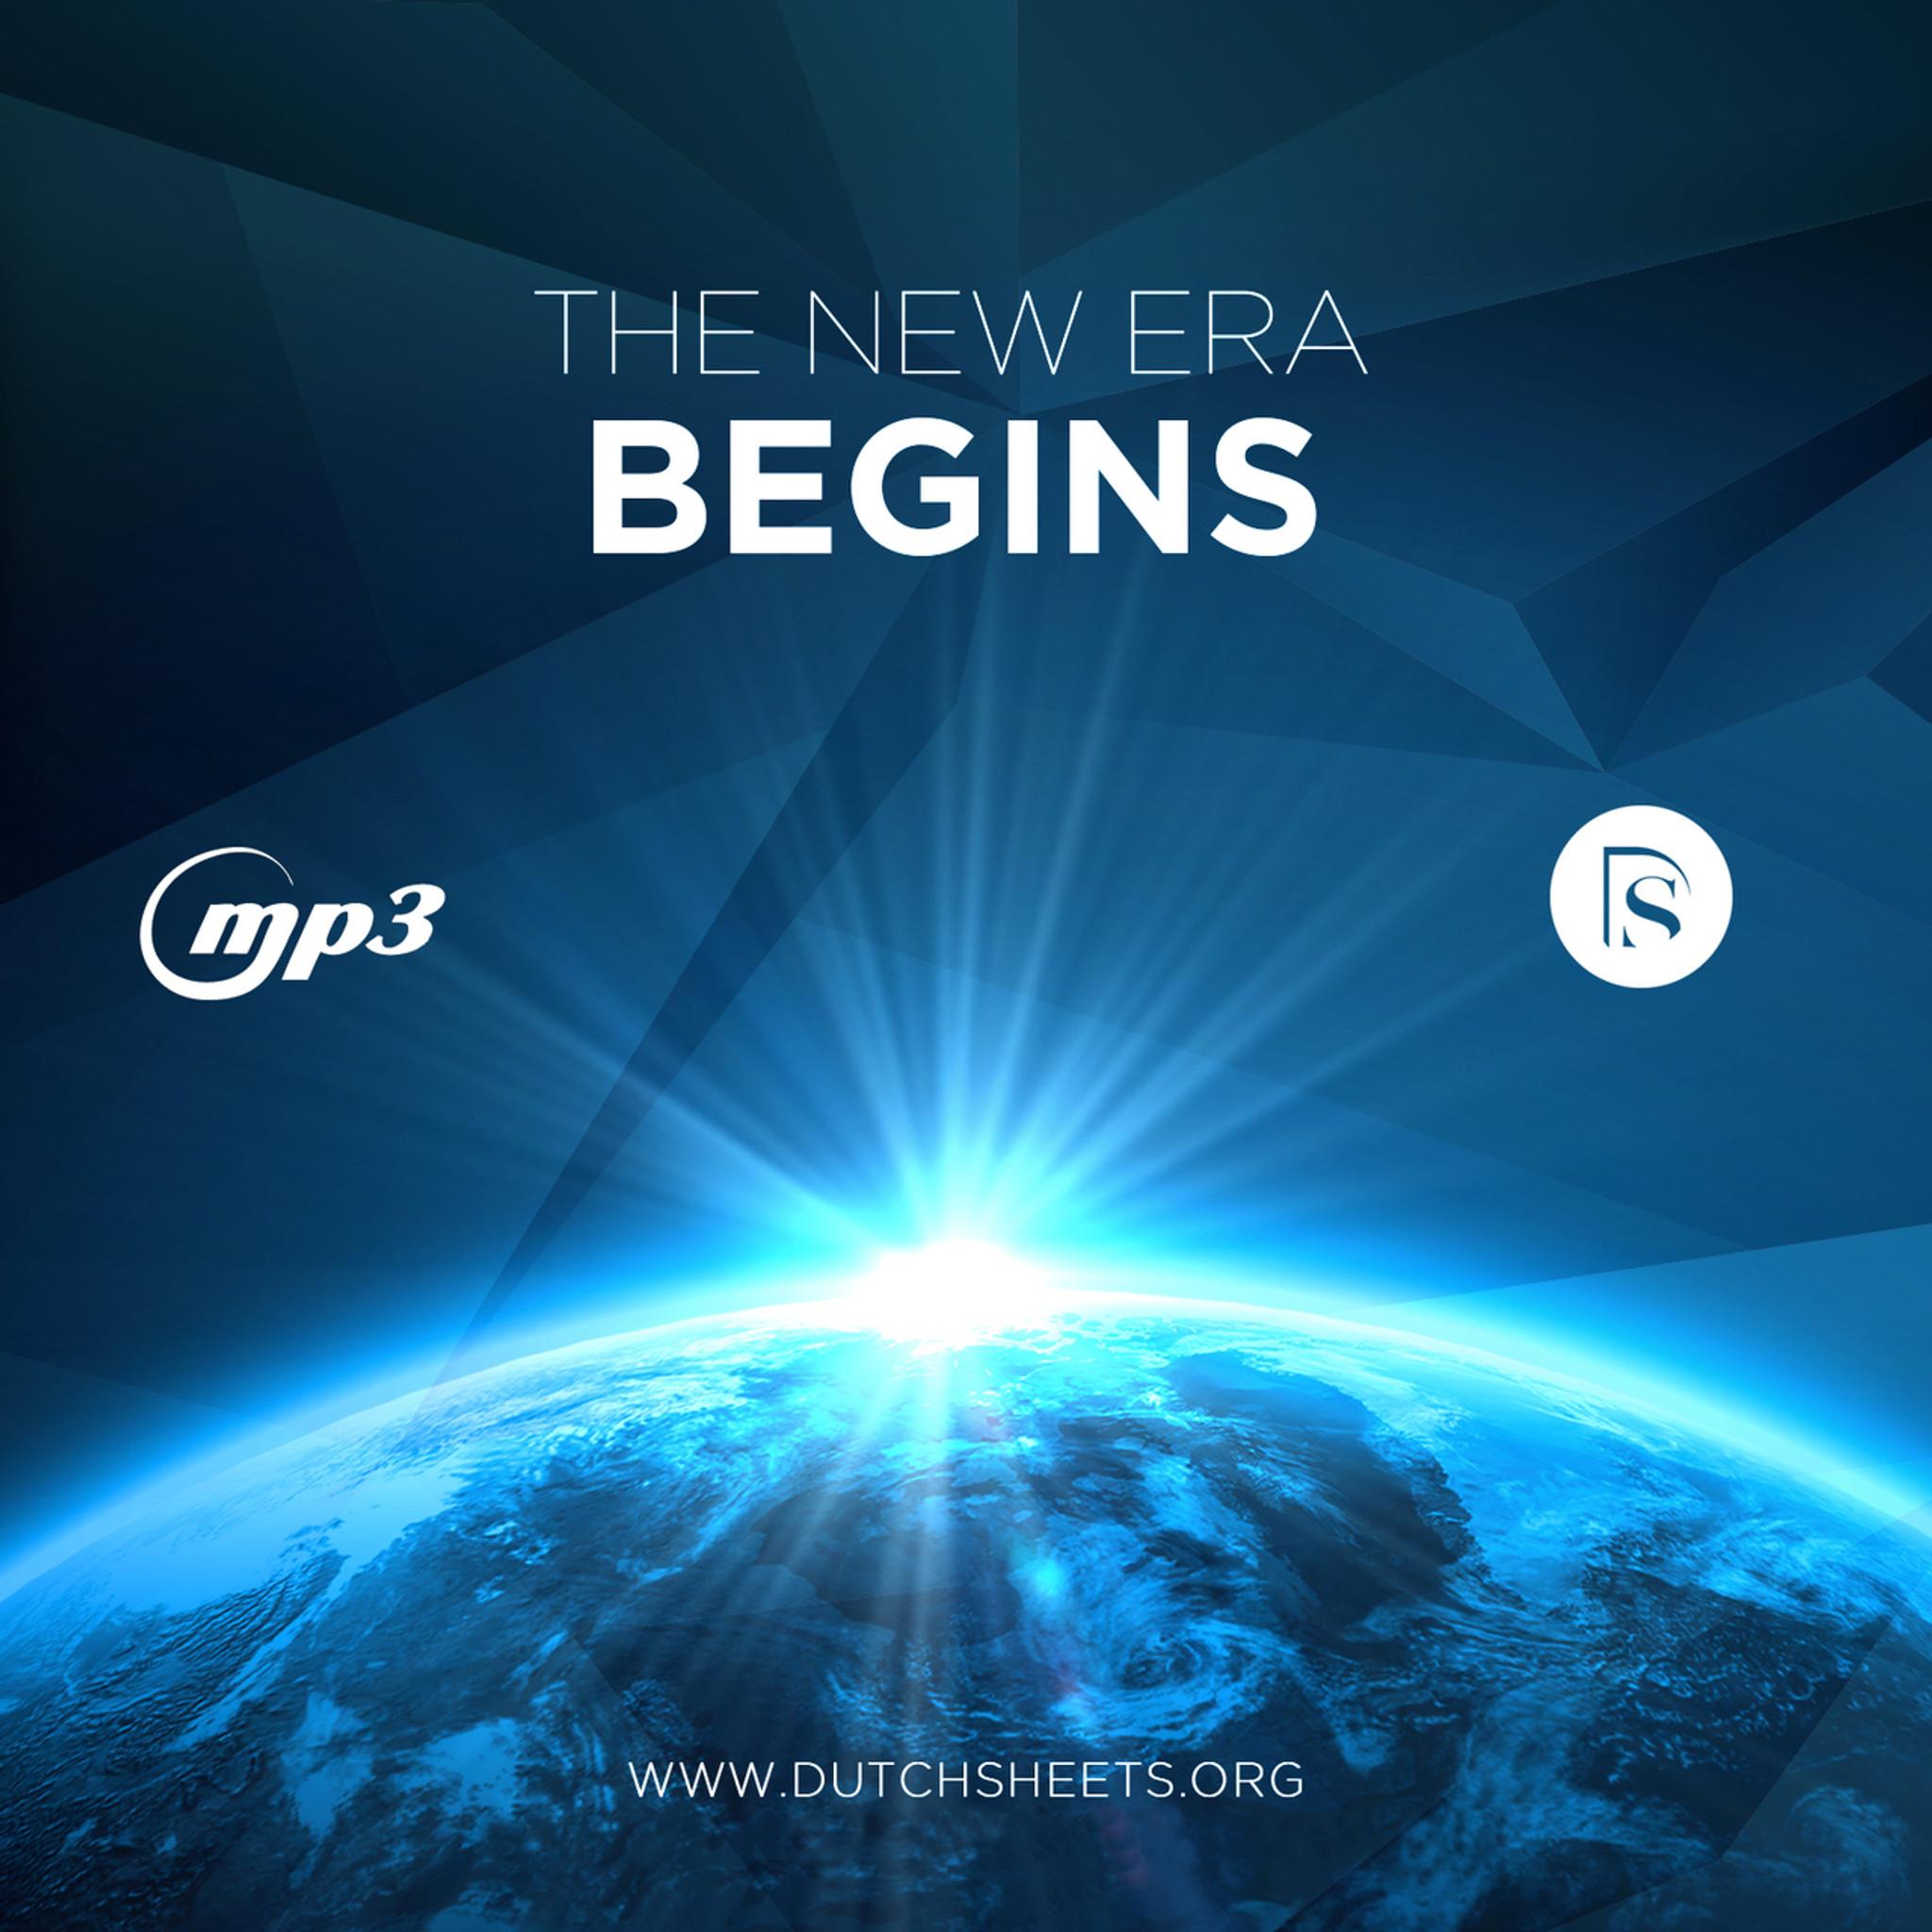 New Era Begins, The (MP3 Download)